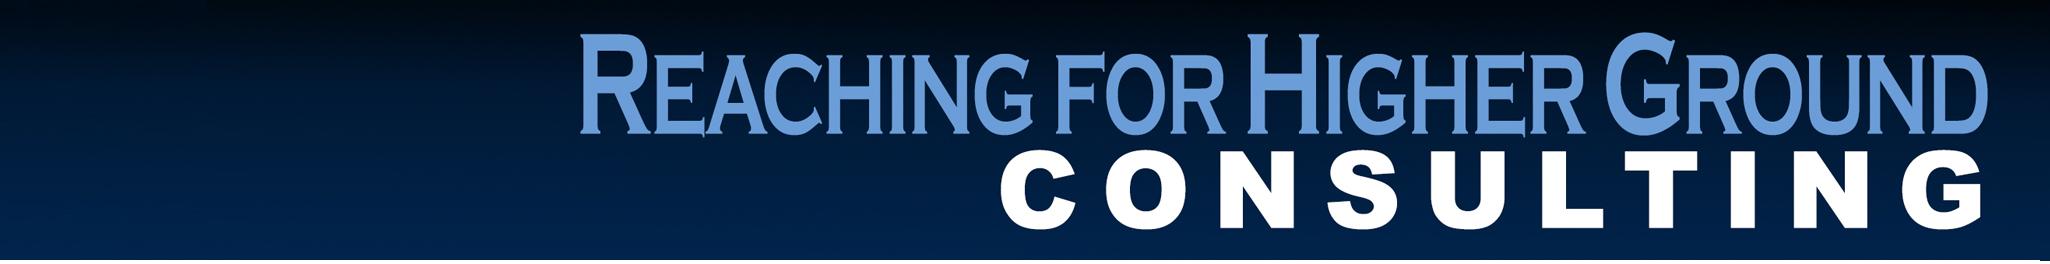 rfhg-logo